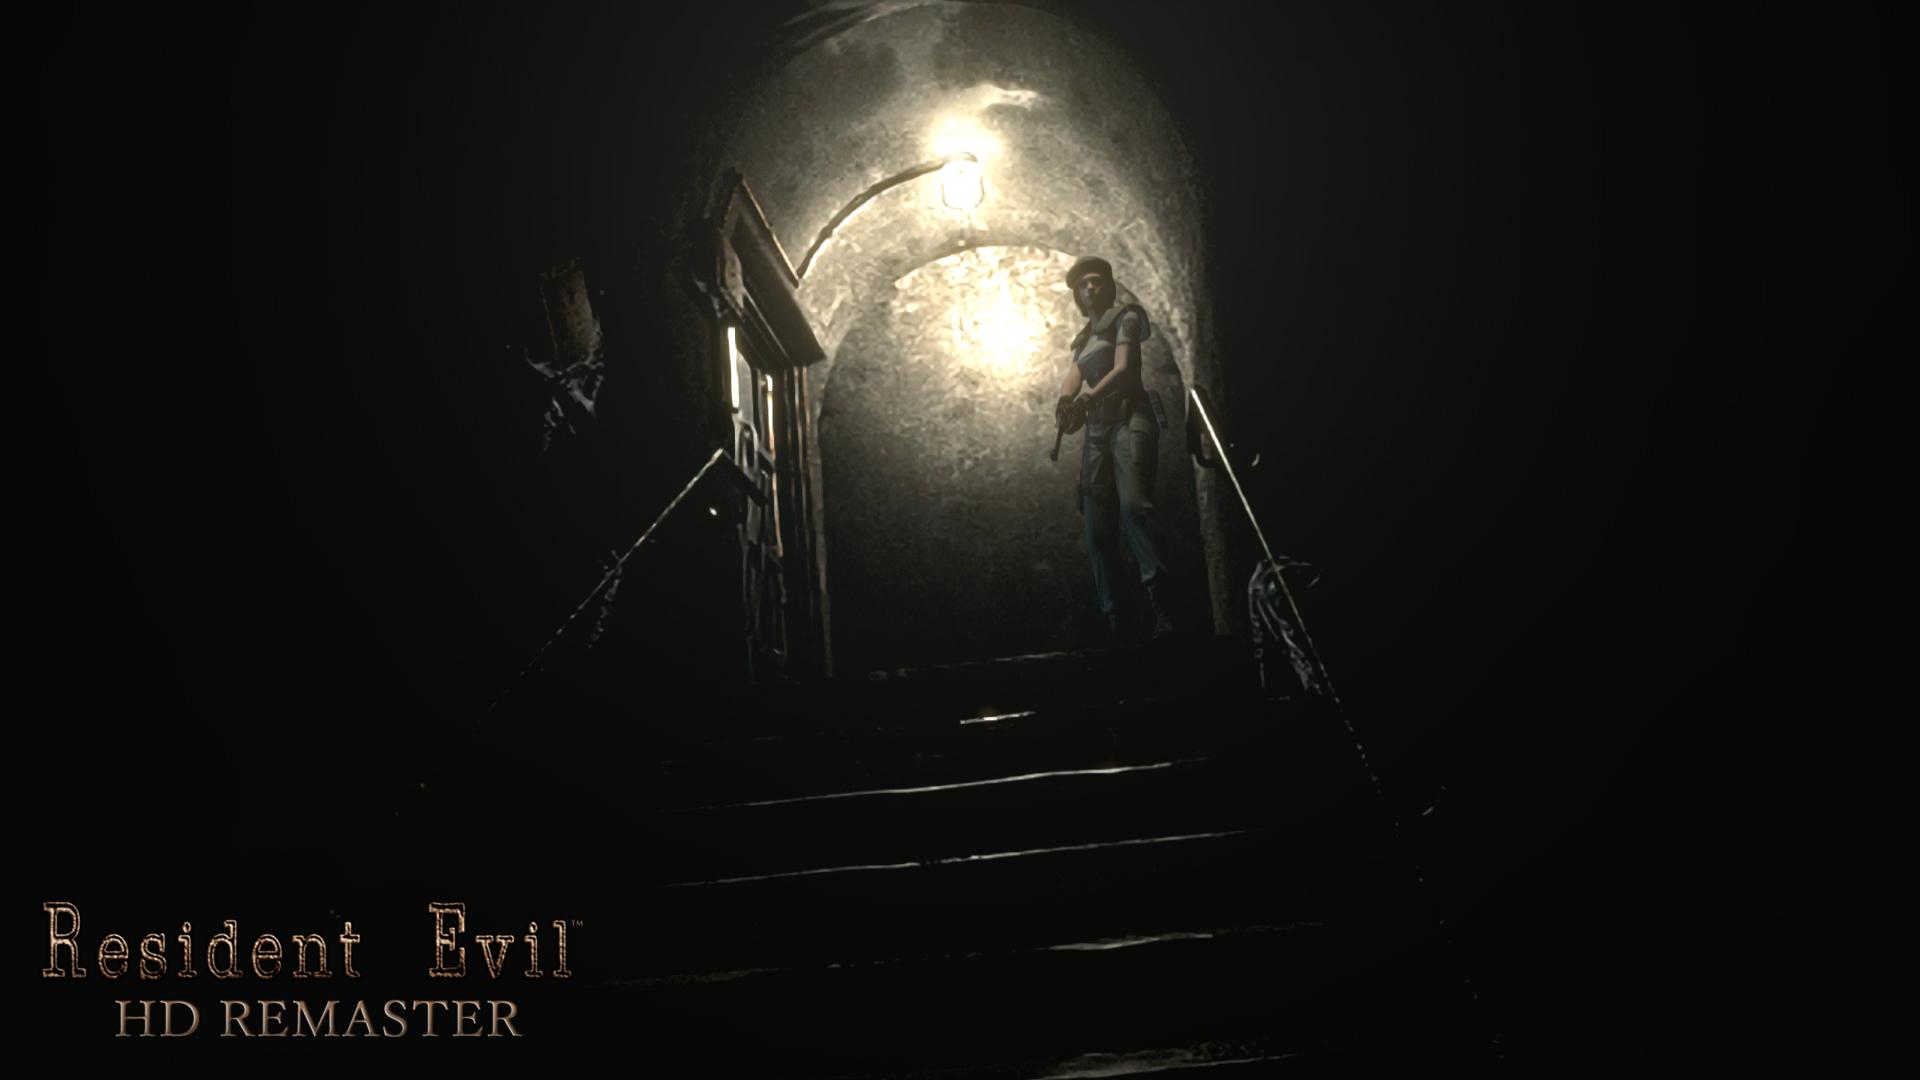 Hd wallpaper resident evil -  Resident Evil Hd Remaster Wallpaper 02 By Sagarhcp88